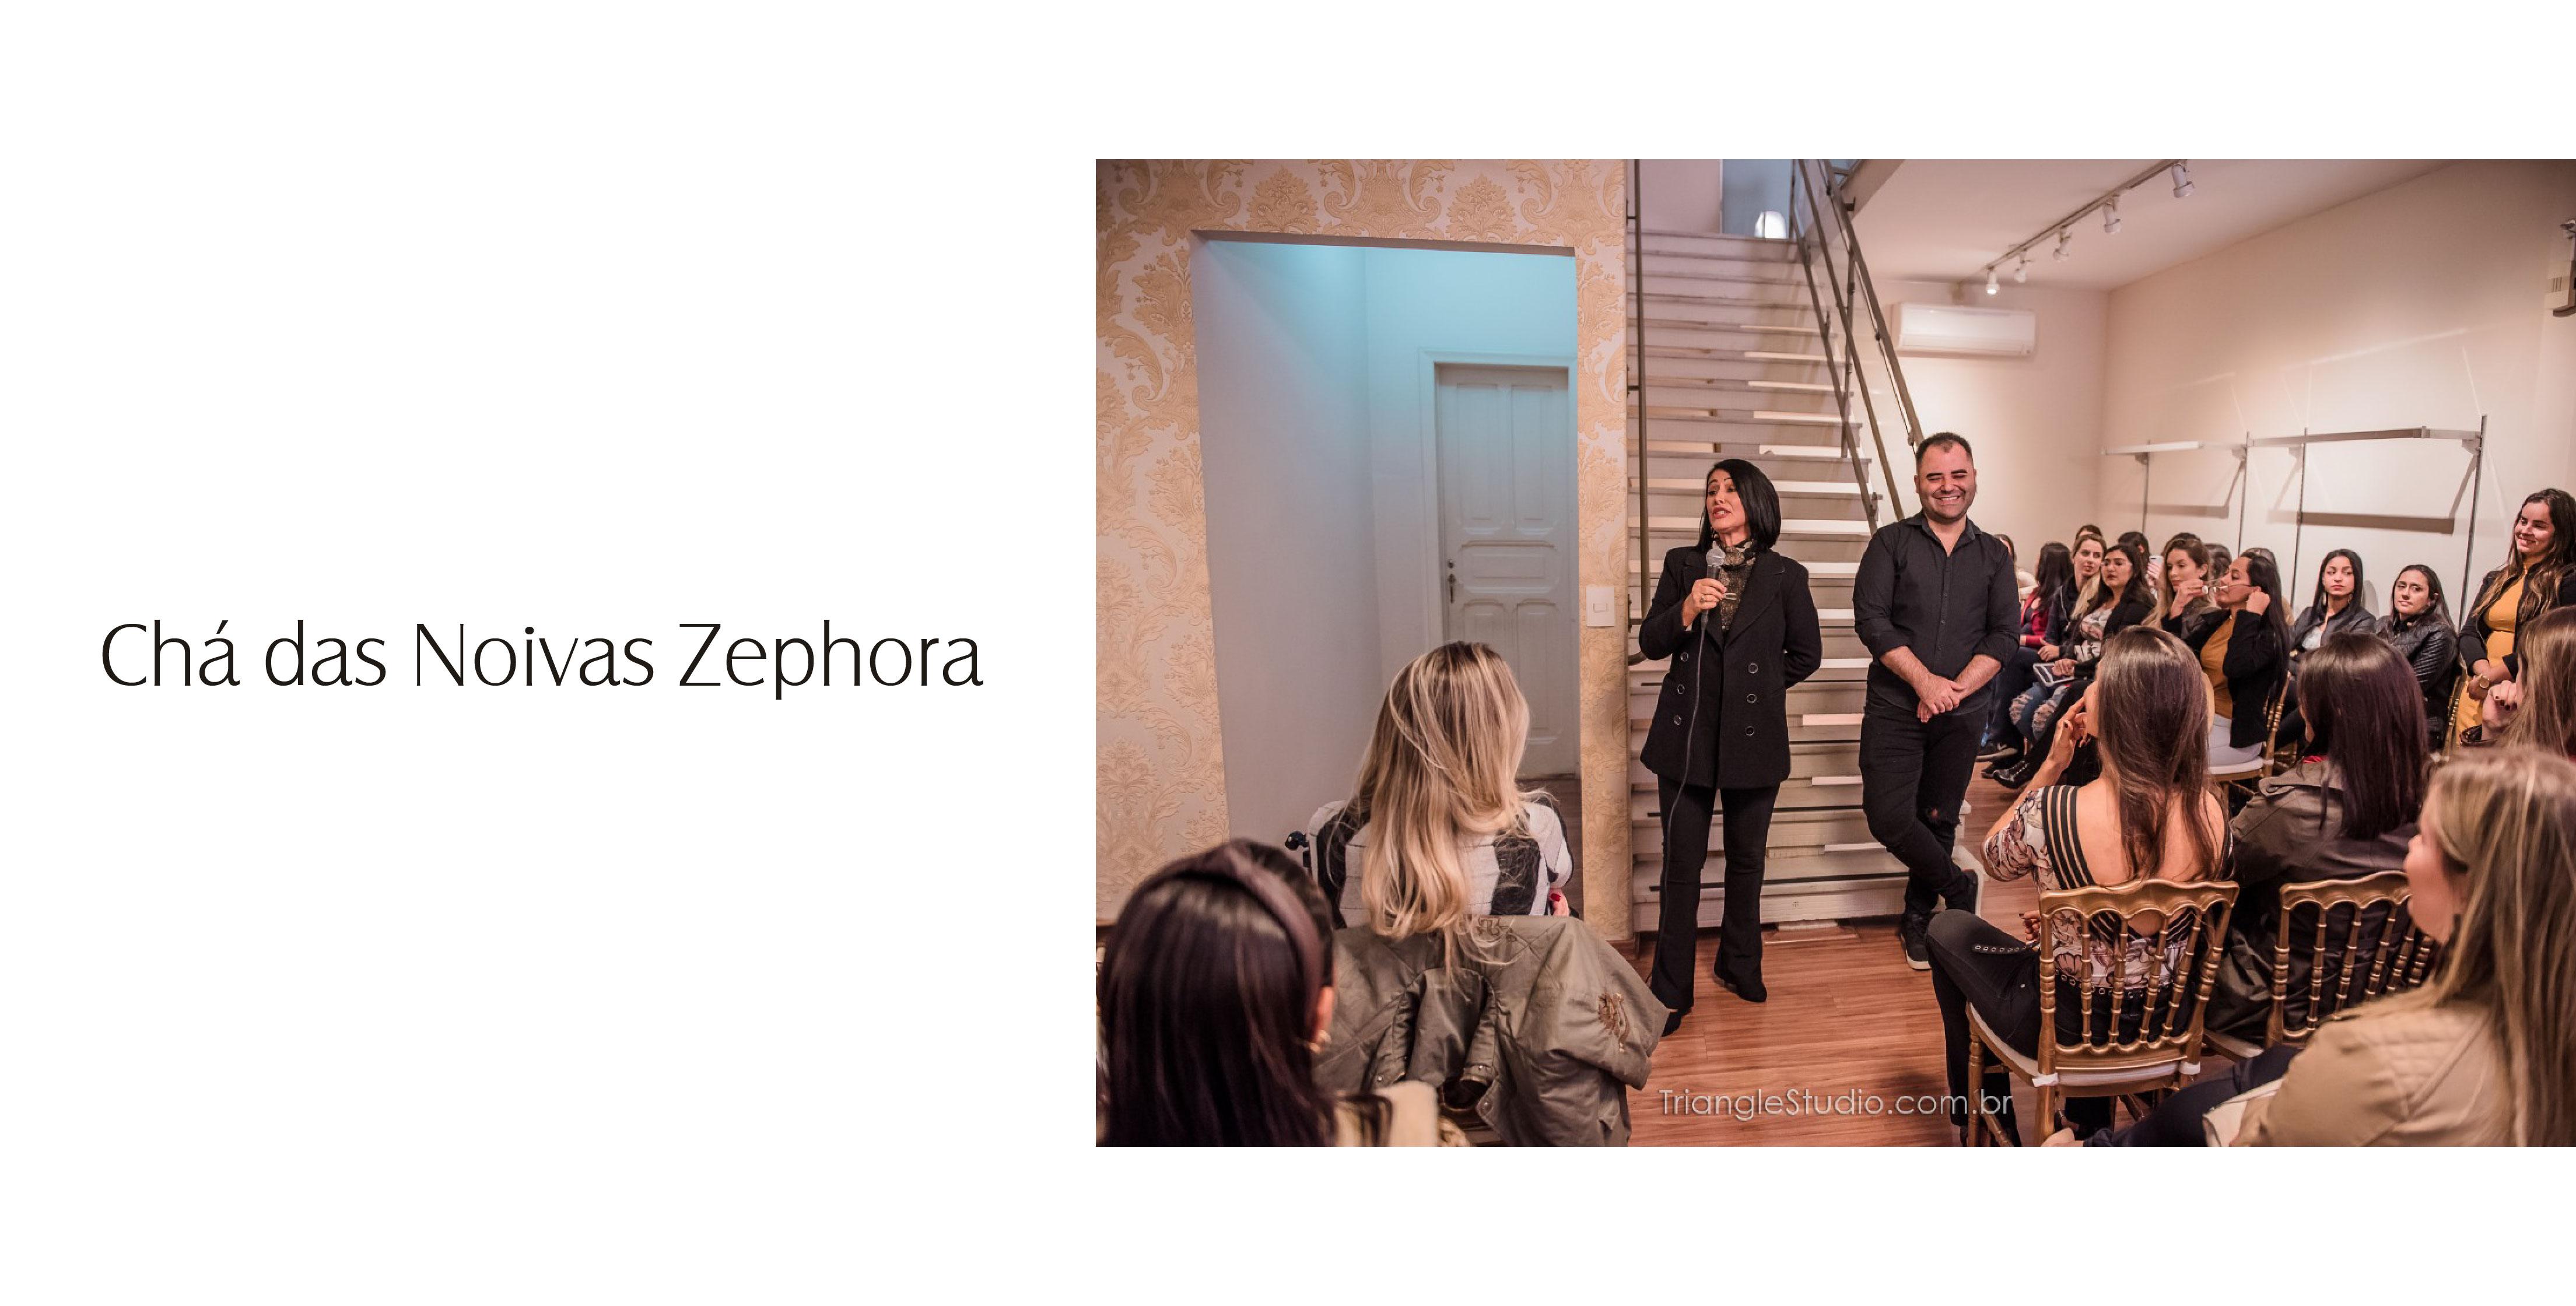 Cha das noivas Zephora 2019